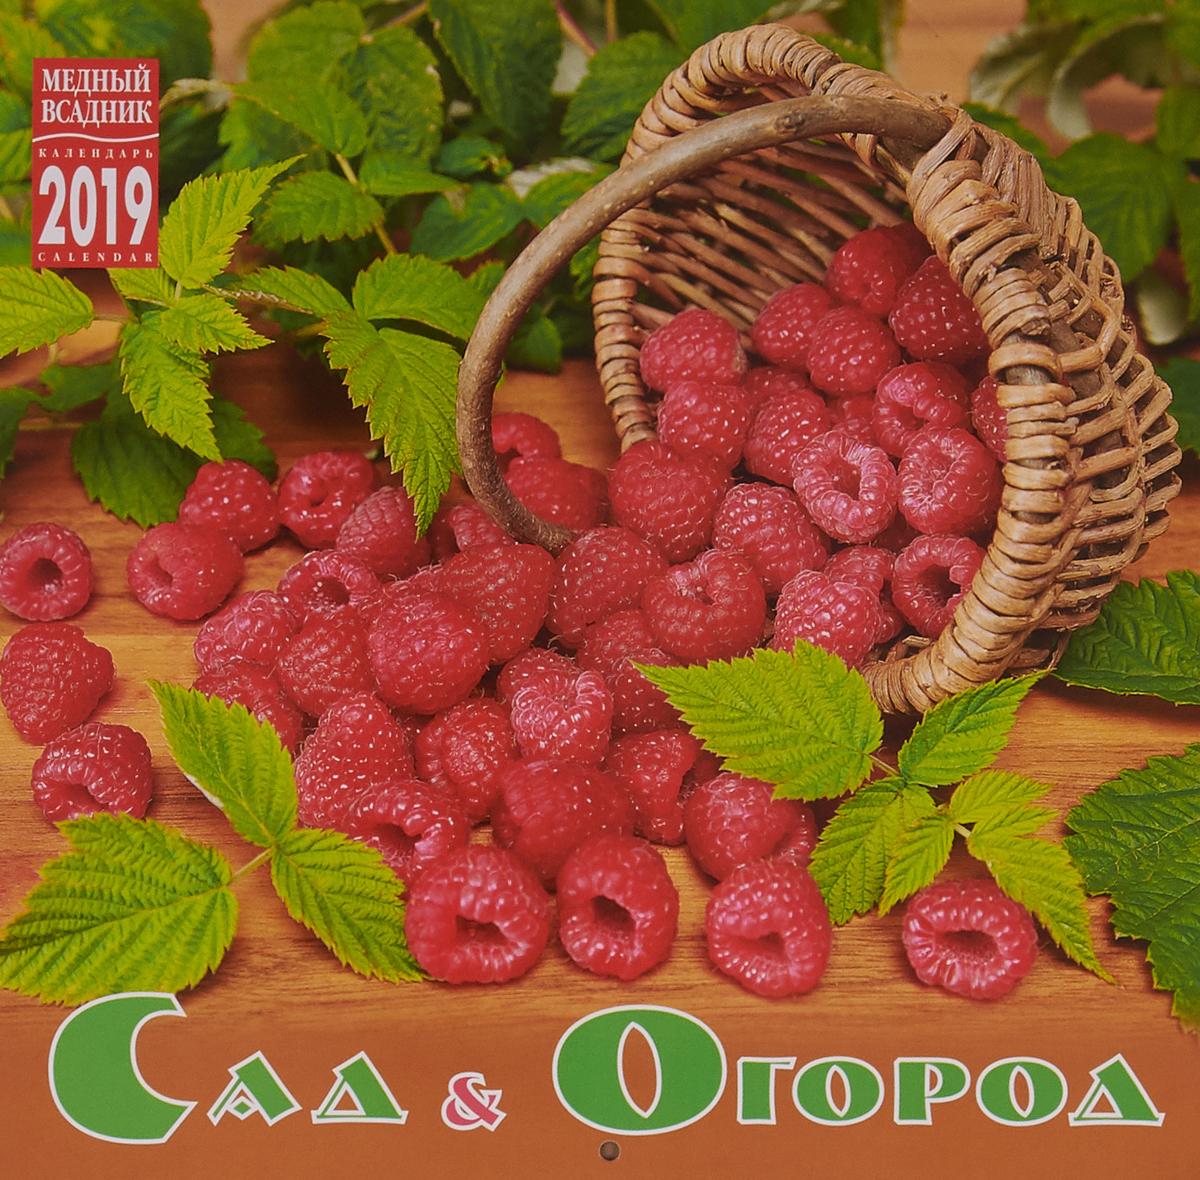 Календарь на скрепке на 2019 год. Сад и огород недорого